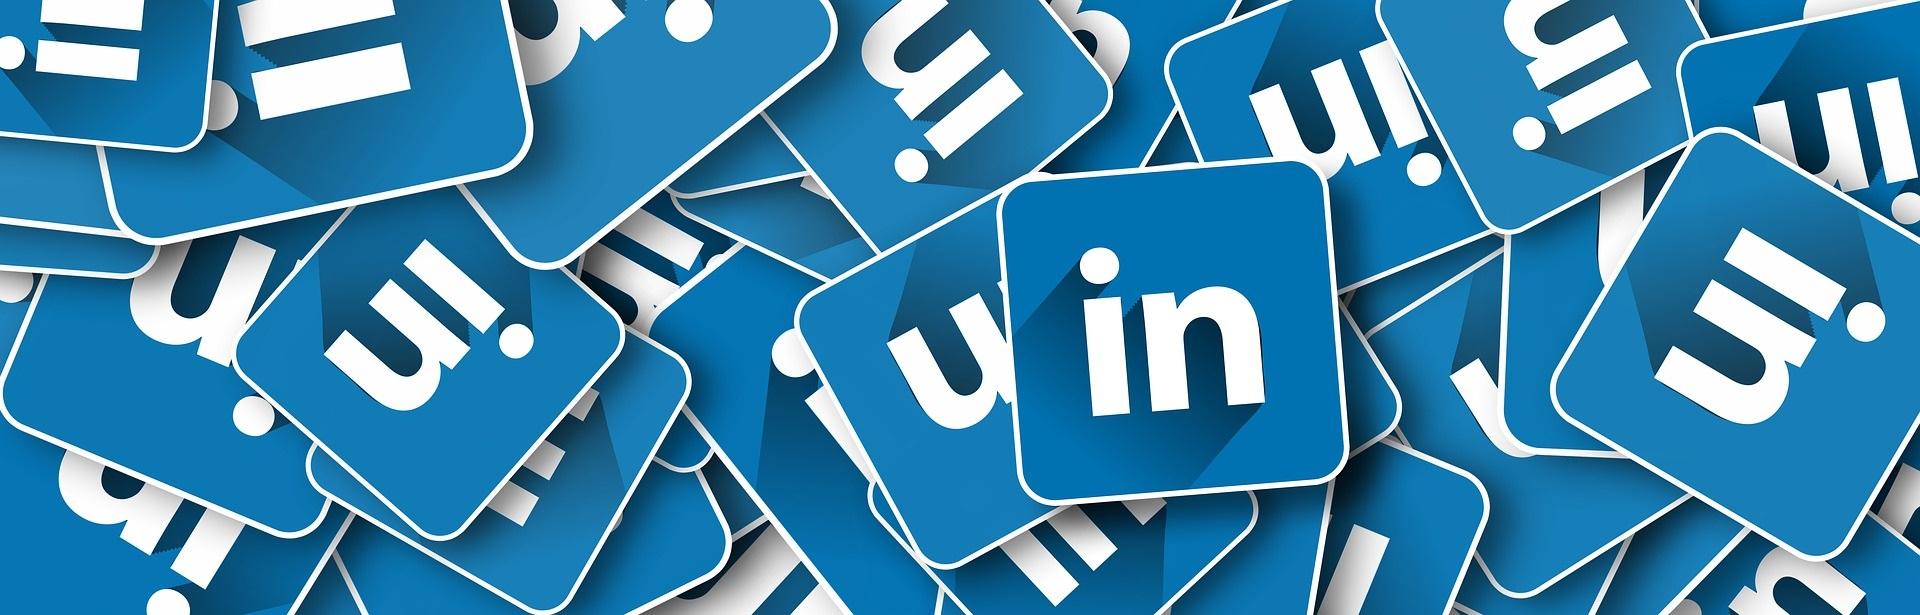 Logos do Linkedin